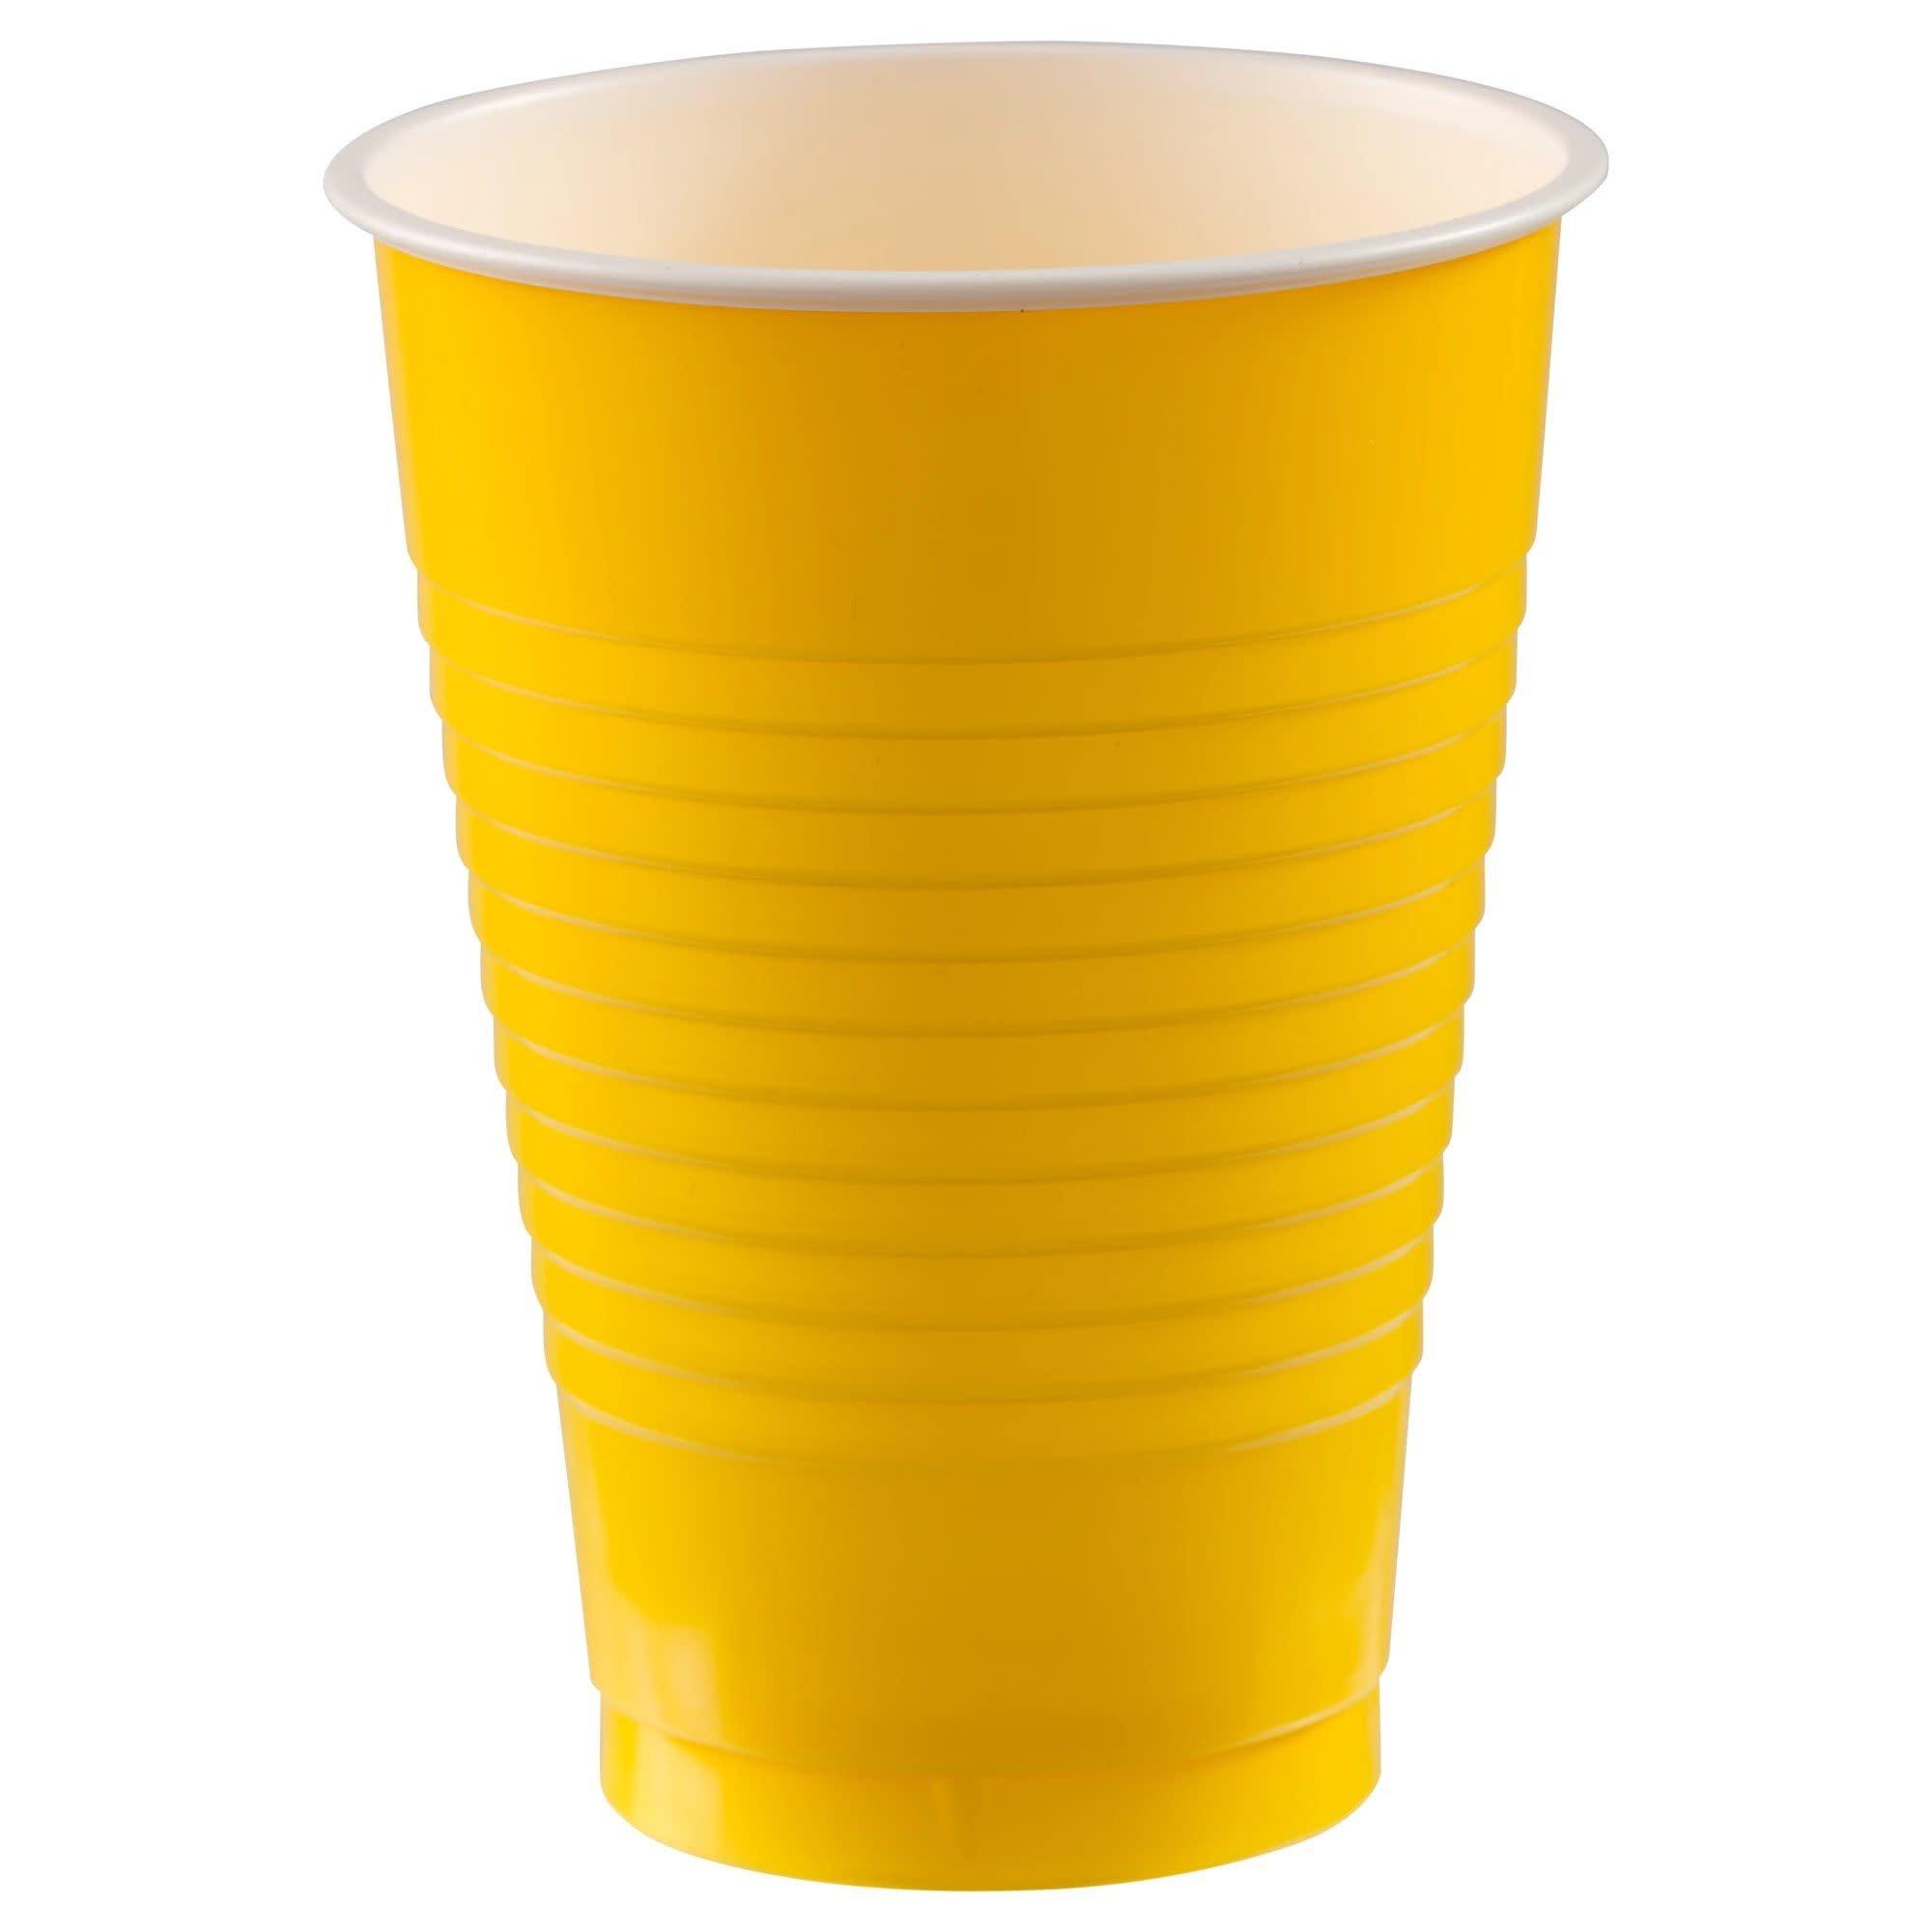 12 Oz. Plastic Cups, Mid Ct. - Yellow Sunshine